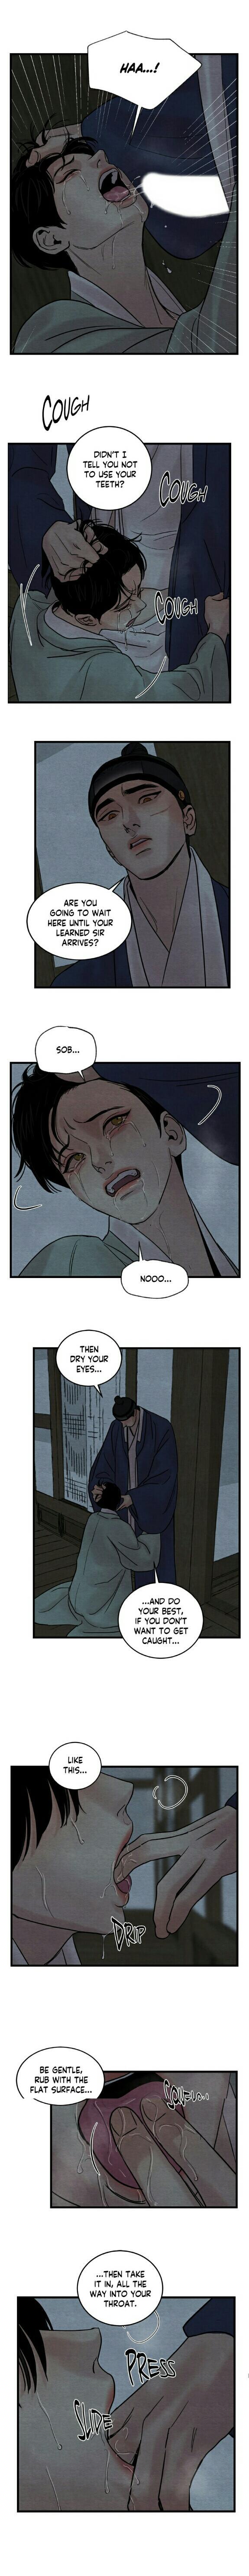 https://manga.mangadogs.com/comics/pic2/60/29436/1019691/4adef779a21771e0a5619a2157c8c22a.jpg Page 1